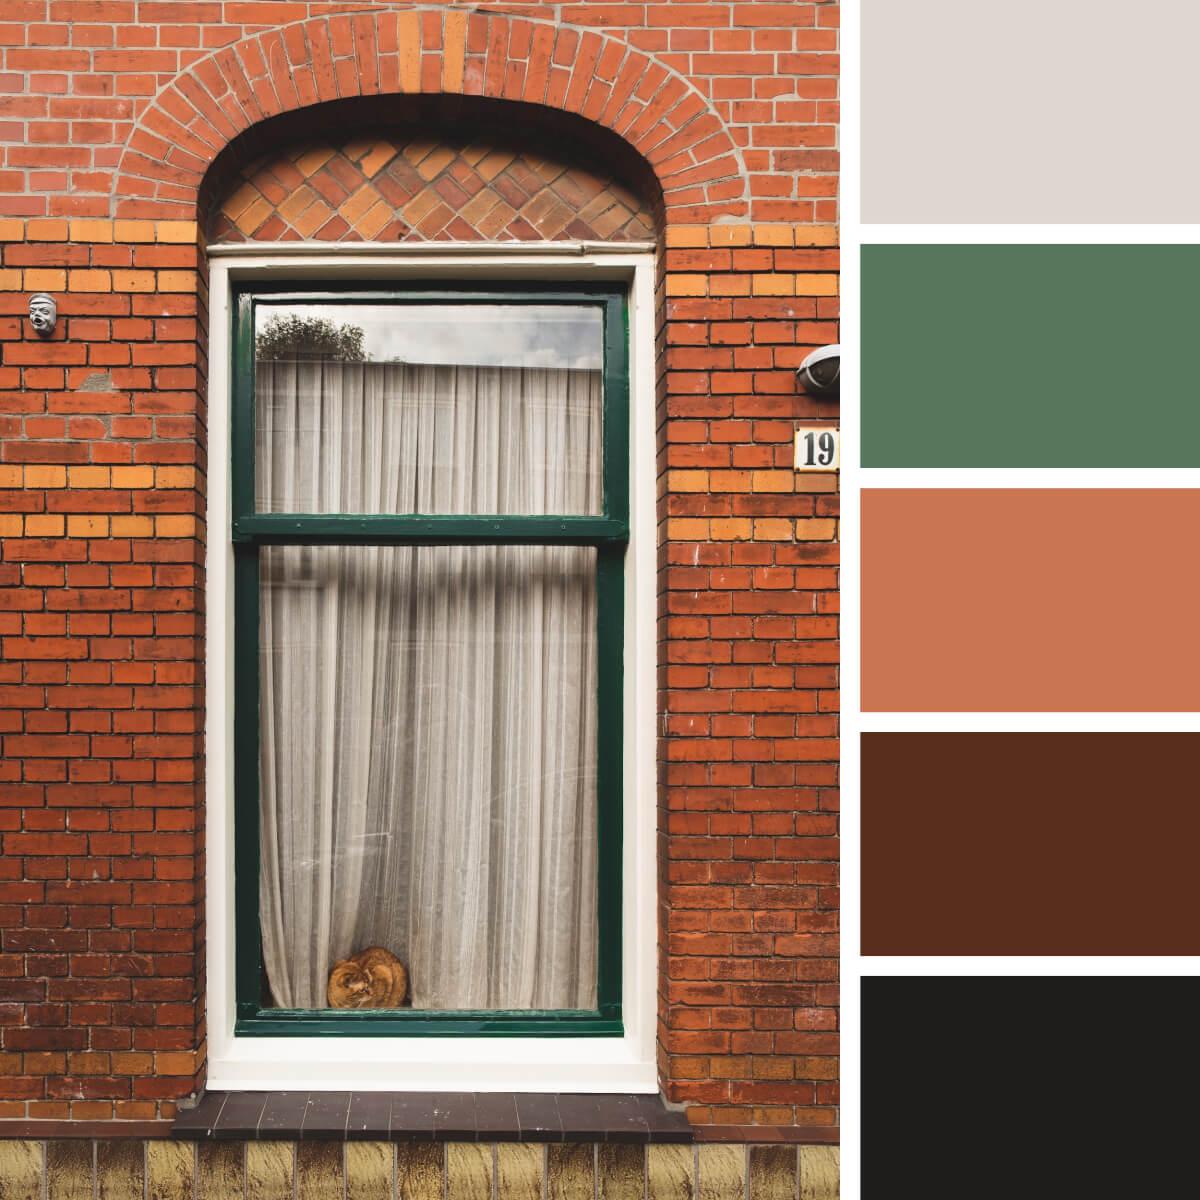 Brick Red & Green